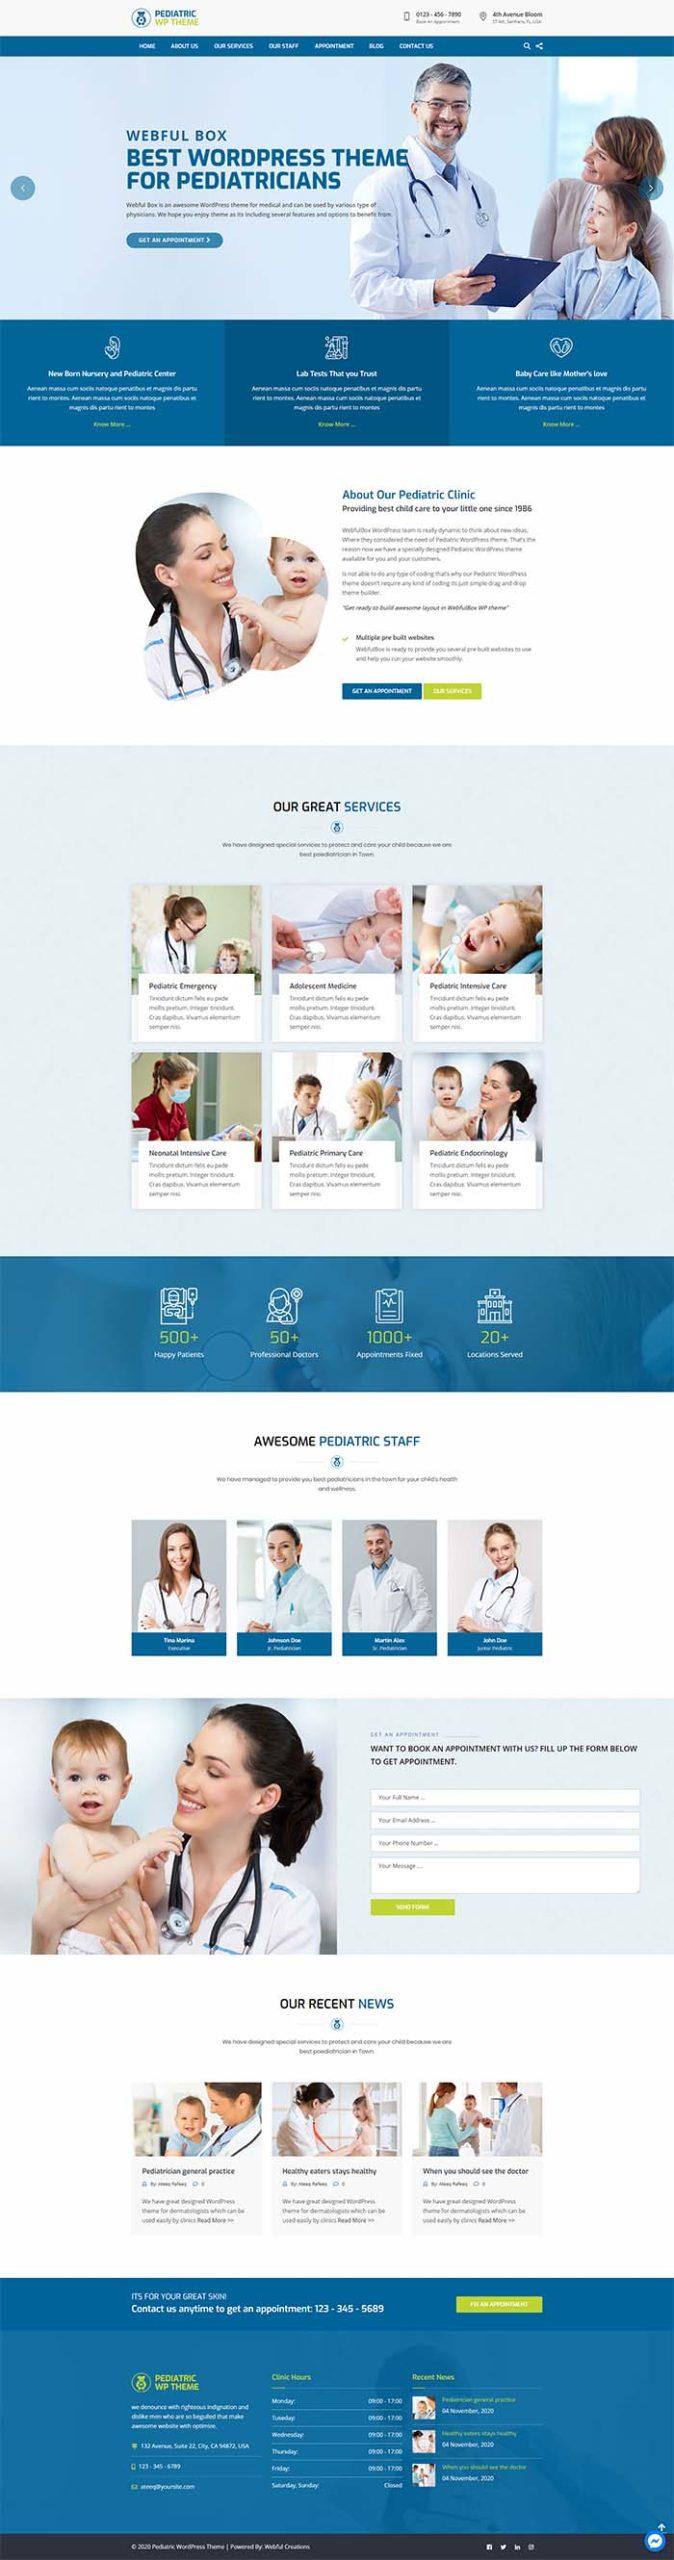 Pediatric WordPress theme - Design